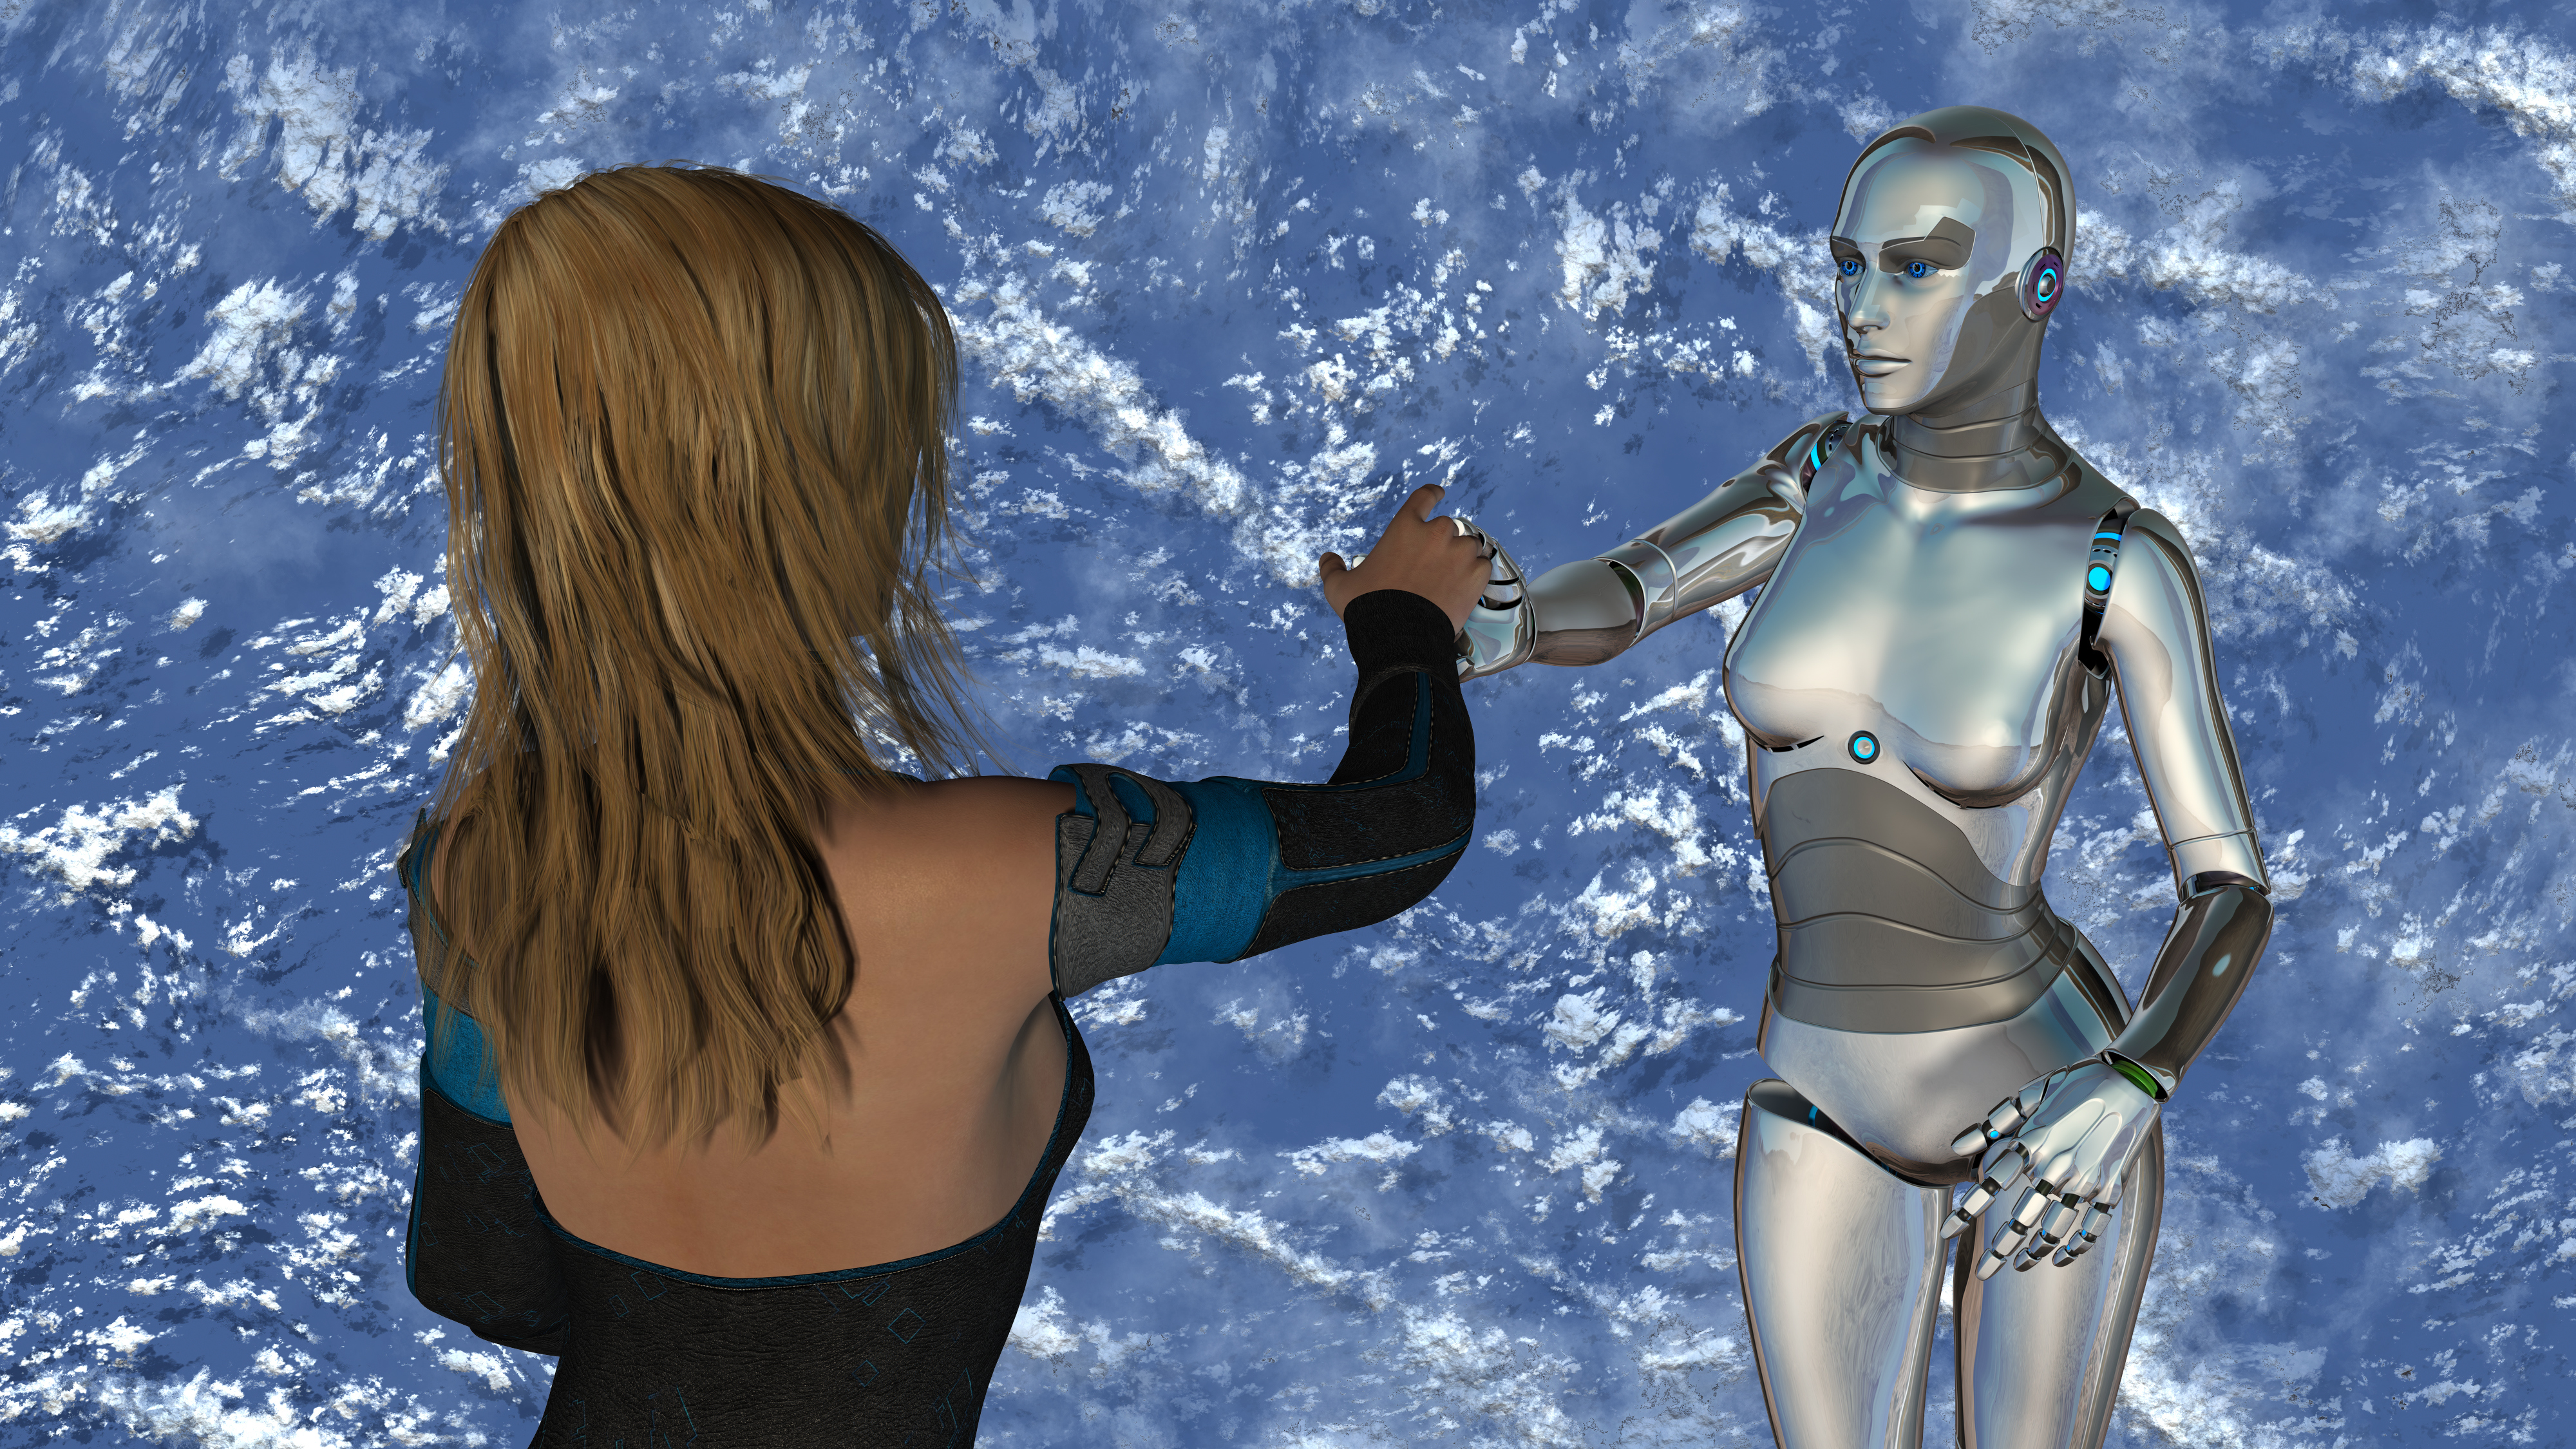 Artificial woman sex images